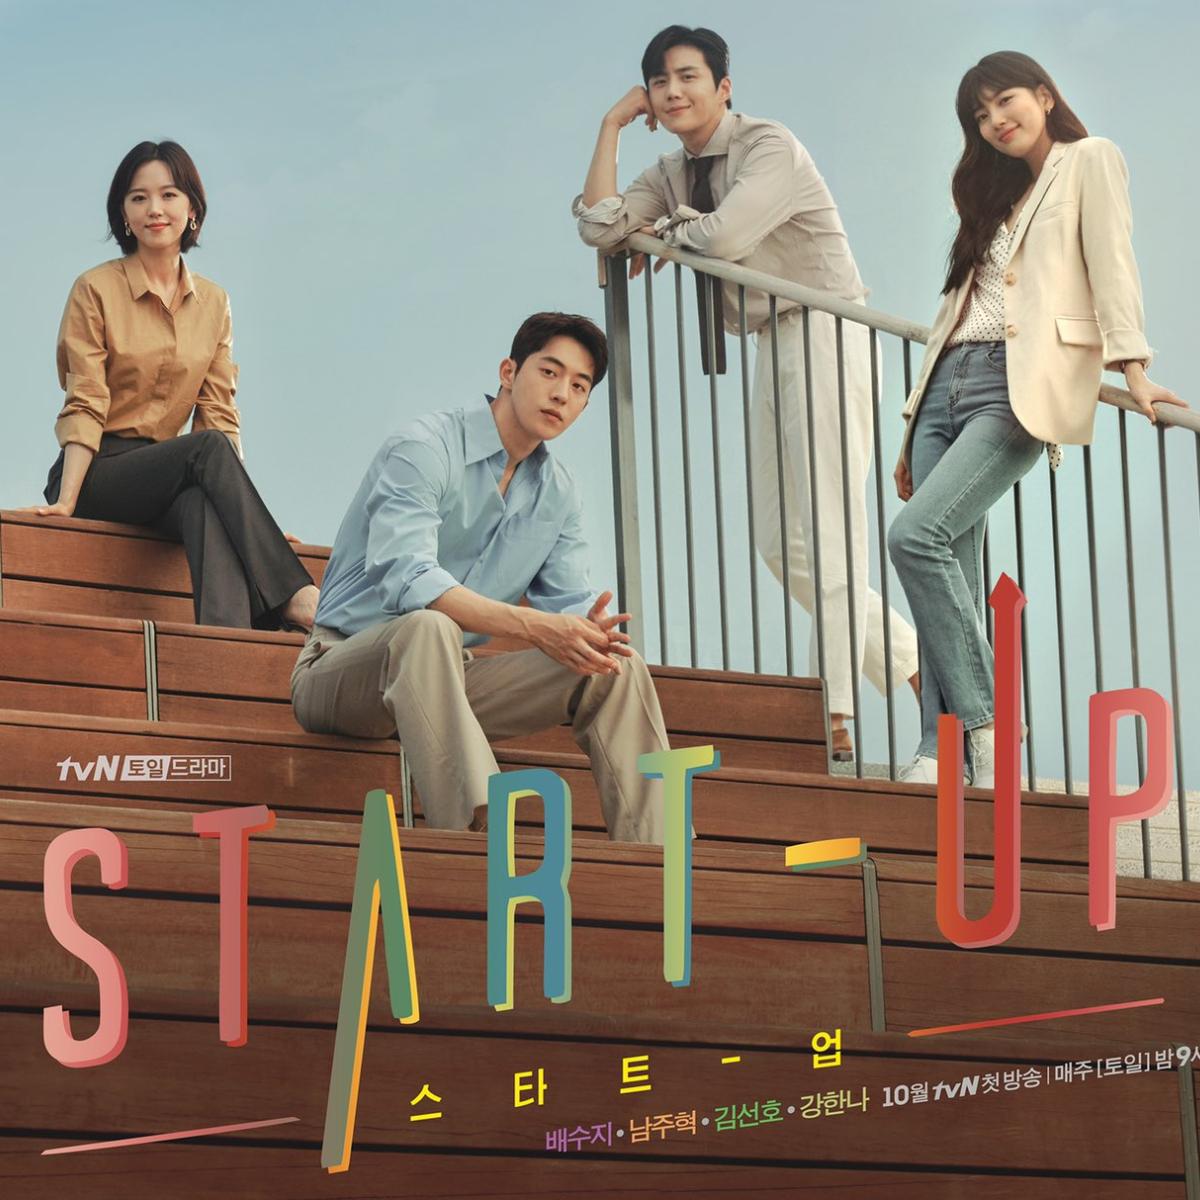 Start Up Poster: Suzy, Nam Joo Hyuk, Kim Seon Ho and Kang Han Na are  determined to achieve their dreams | PINKVILLA